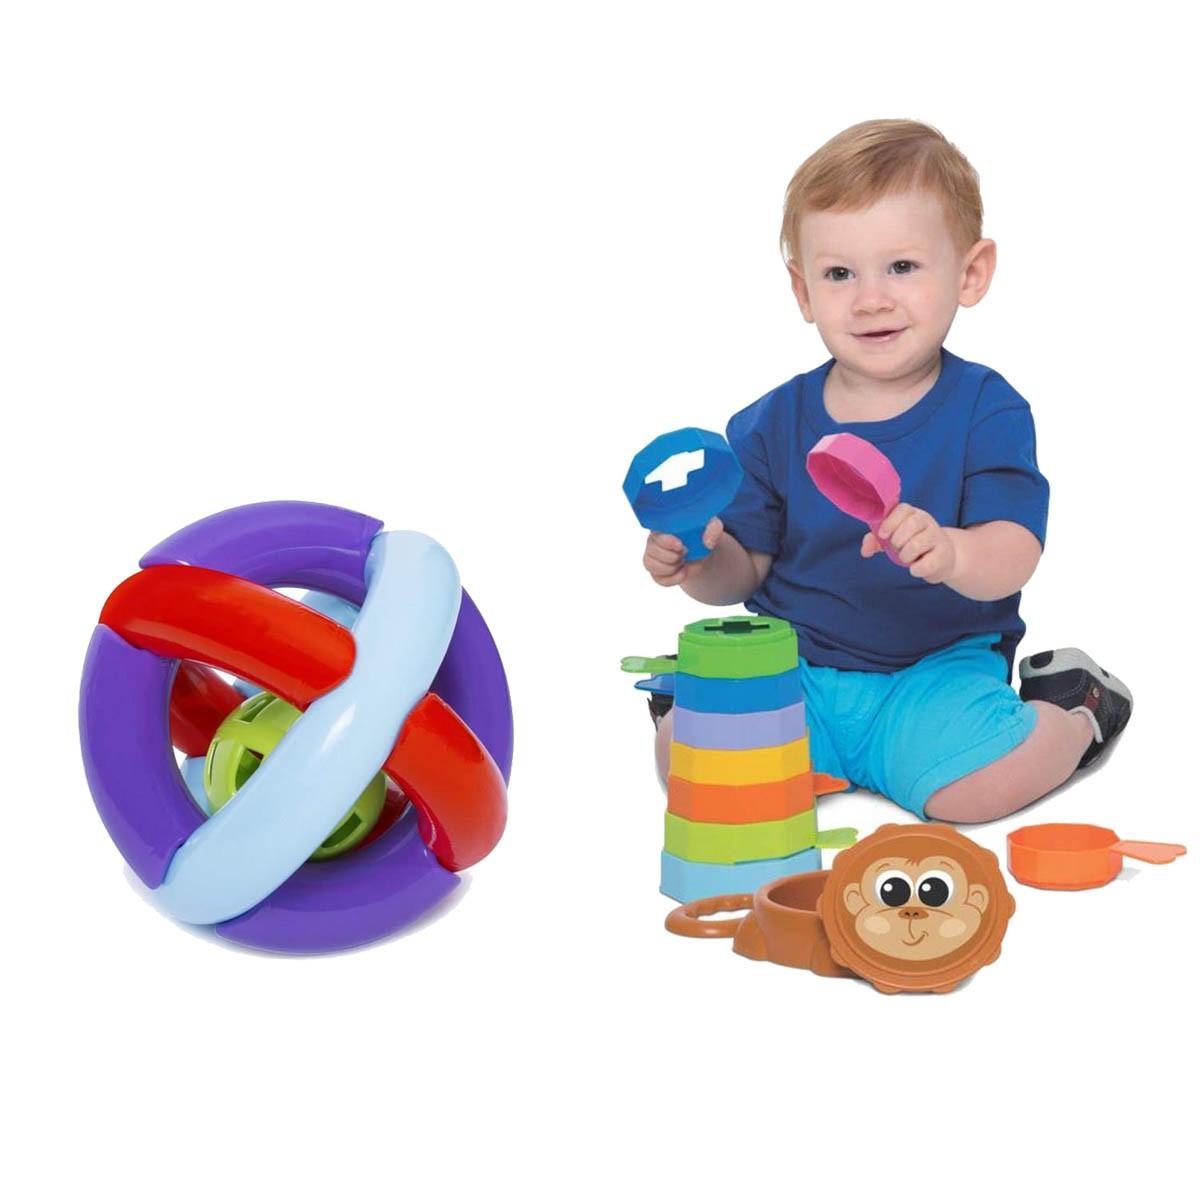 Kit de Brinquedos Educativos Bola + Empilha